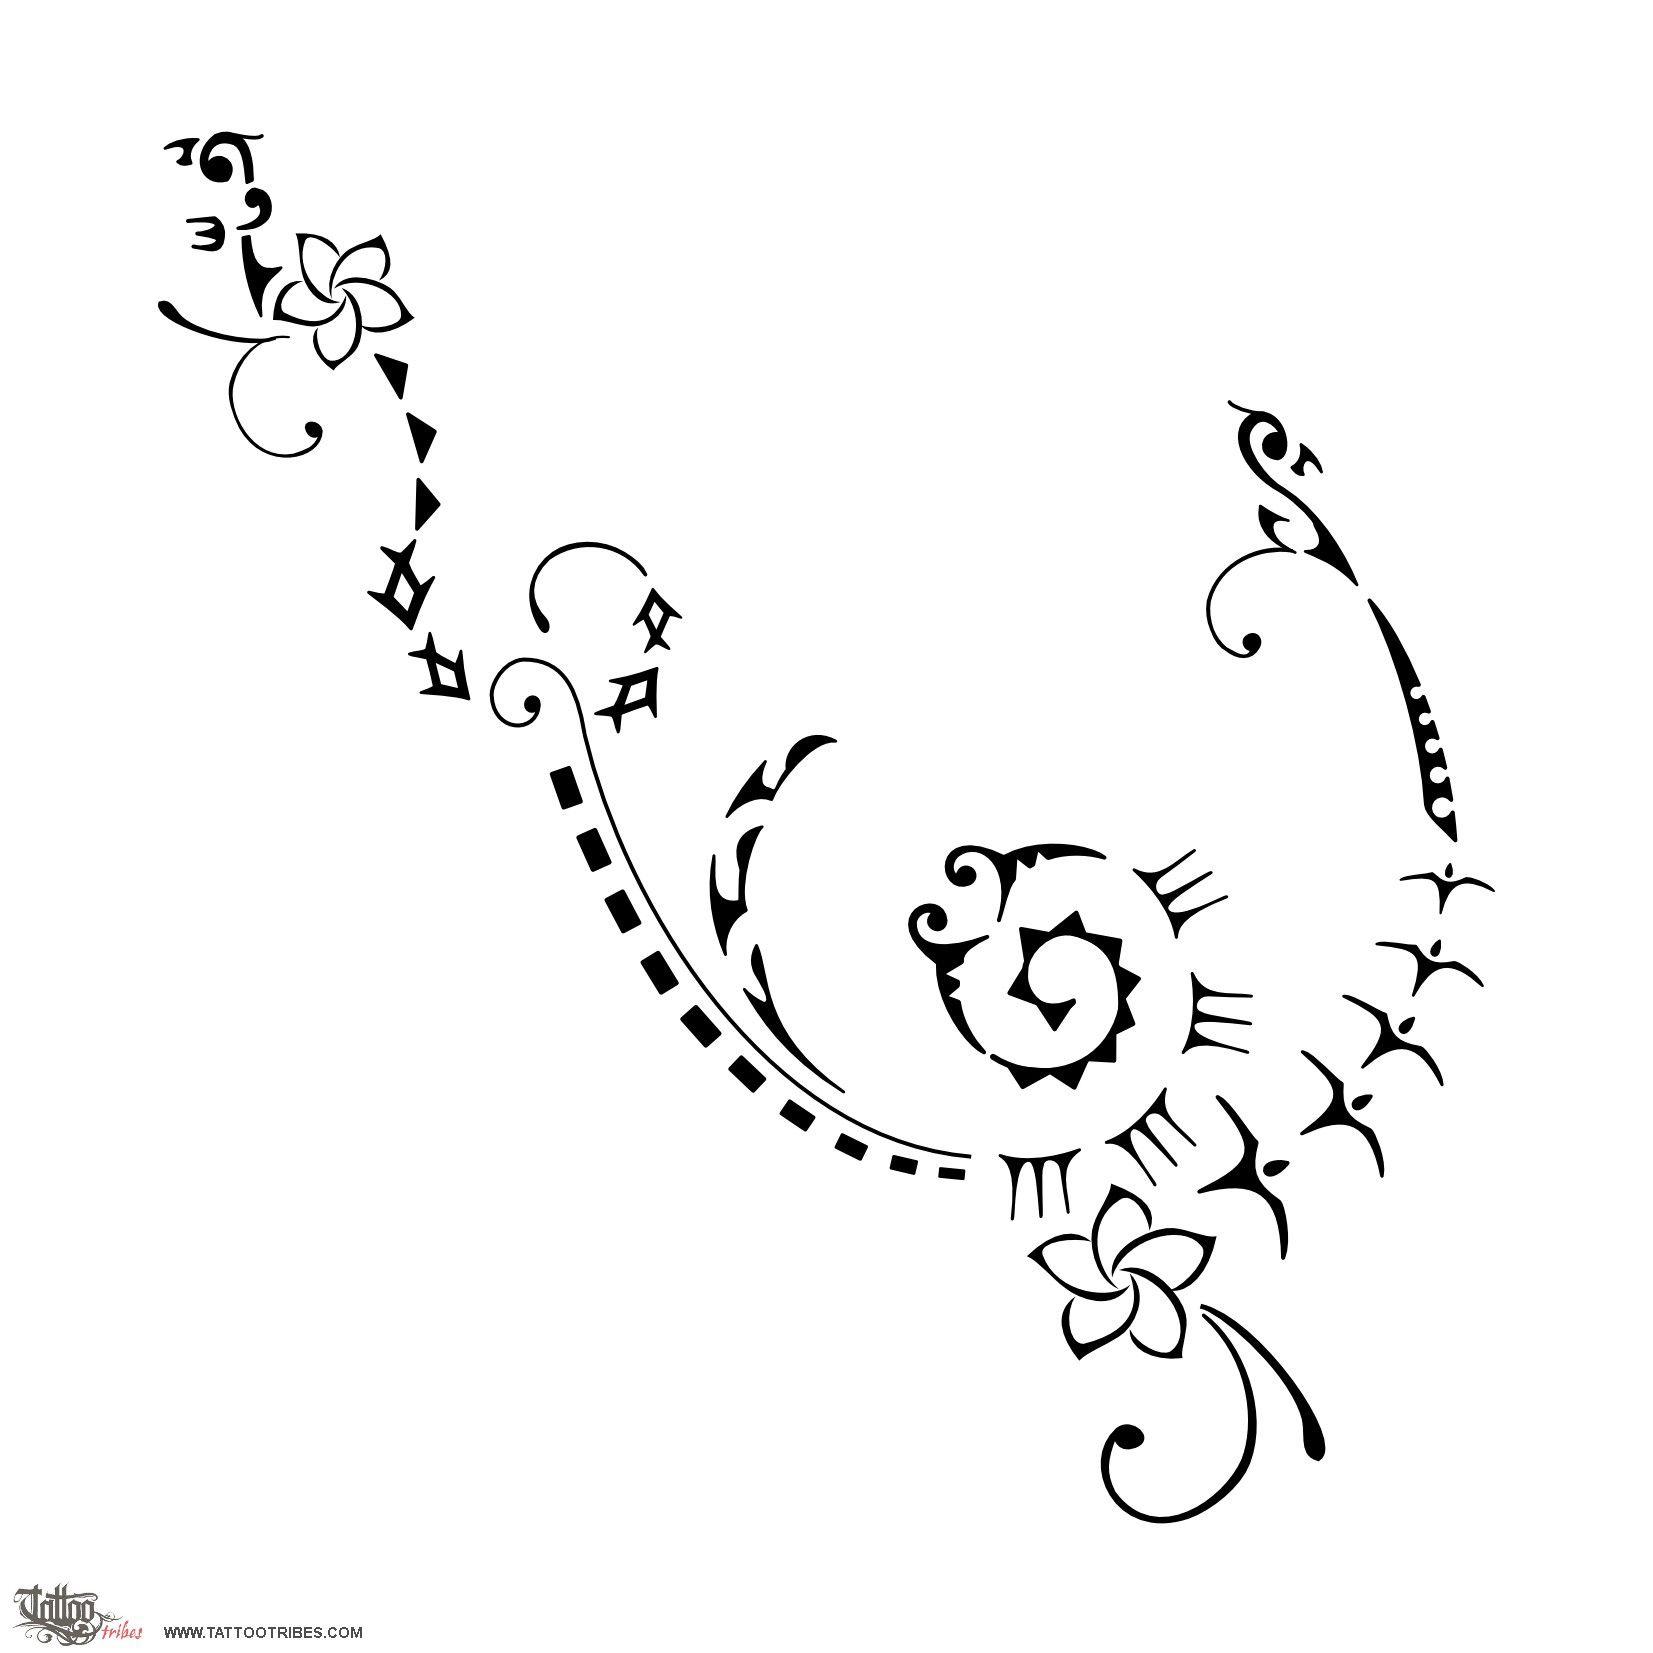 Tatuaggio Di Forza Interiore Rinascita Tattoo Custom Tattoo